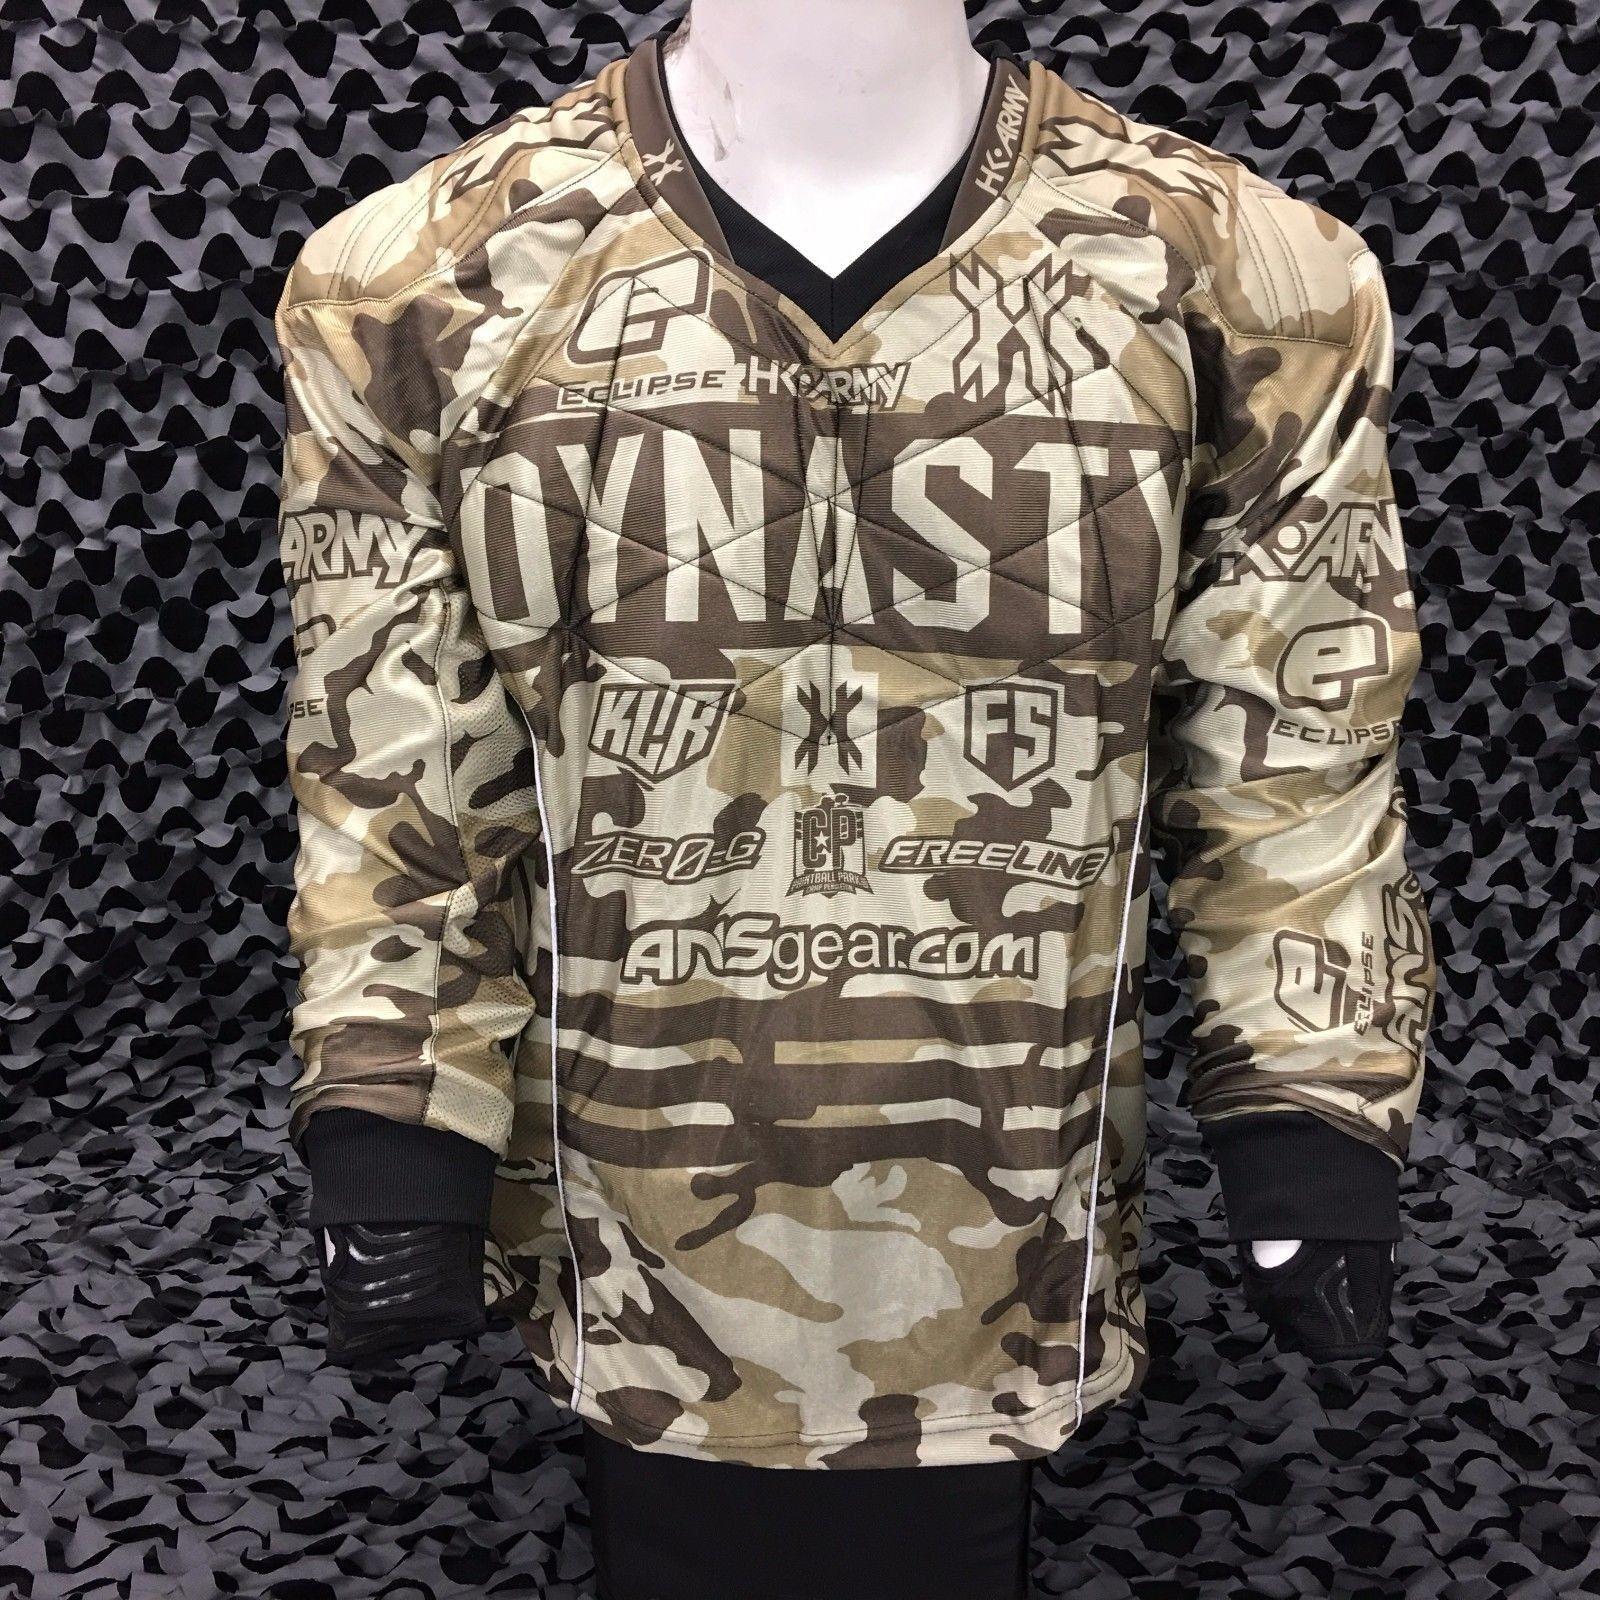 3afb68244 HK Army 2017 Dynasty Hardline Paintball Jersey - Camo